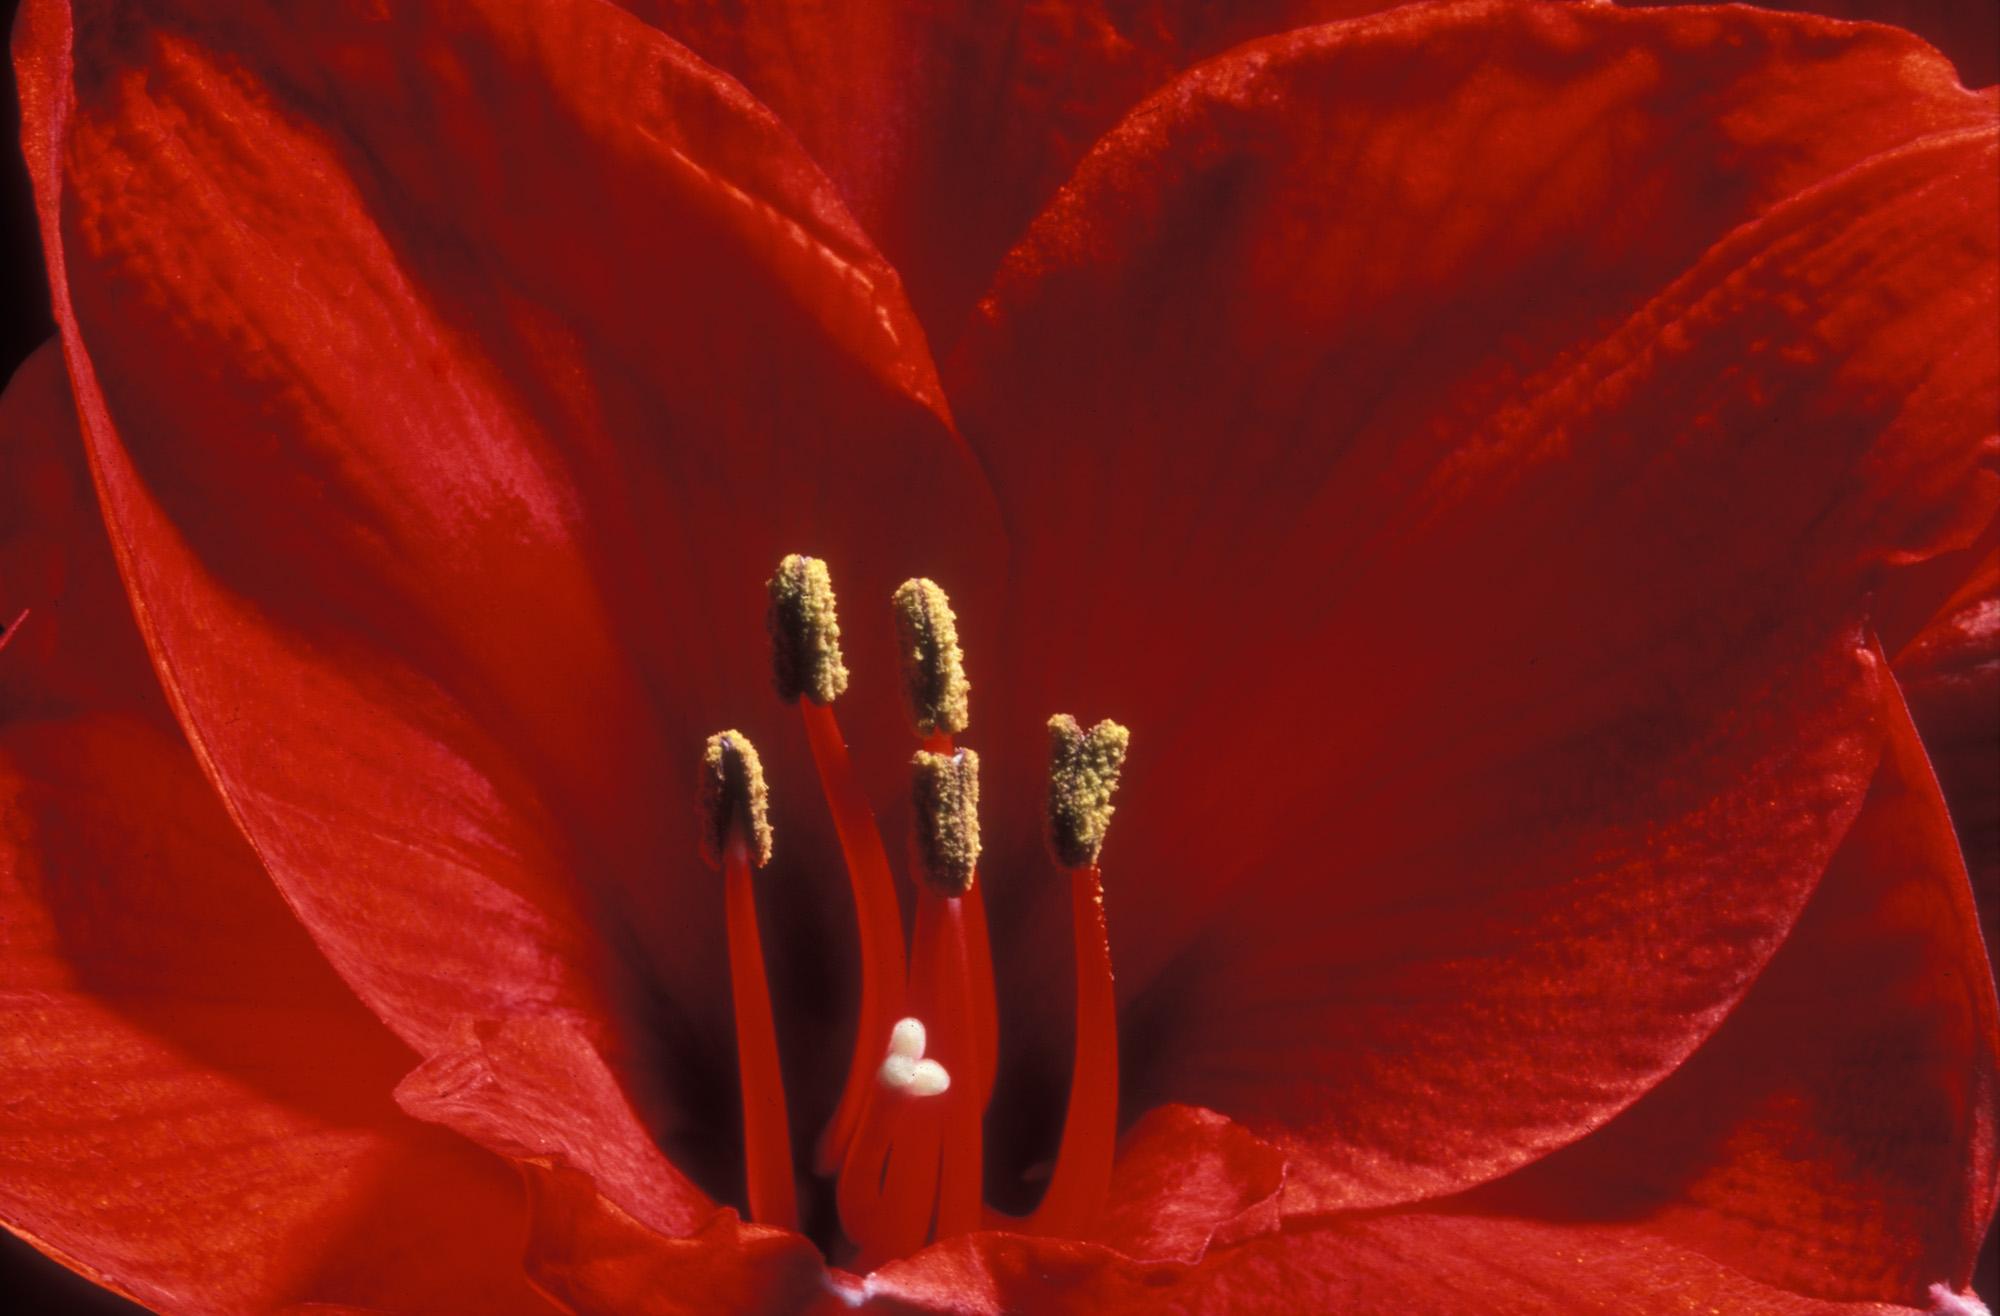 Blüte, Blüten, Pflanze, Pflanzen, Natur, Wachstum, Leben, Stempel, Blätter, Makrobereich, Makro, analog, Großformat, analoge Fotografie, Amarilis, rot